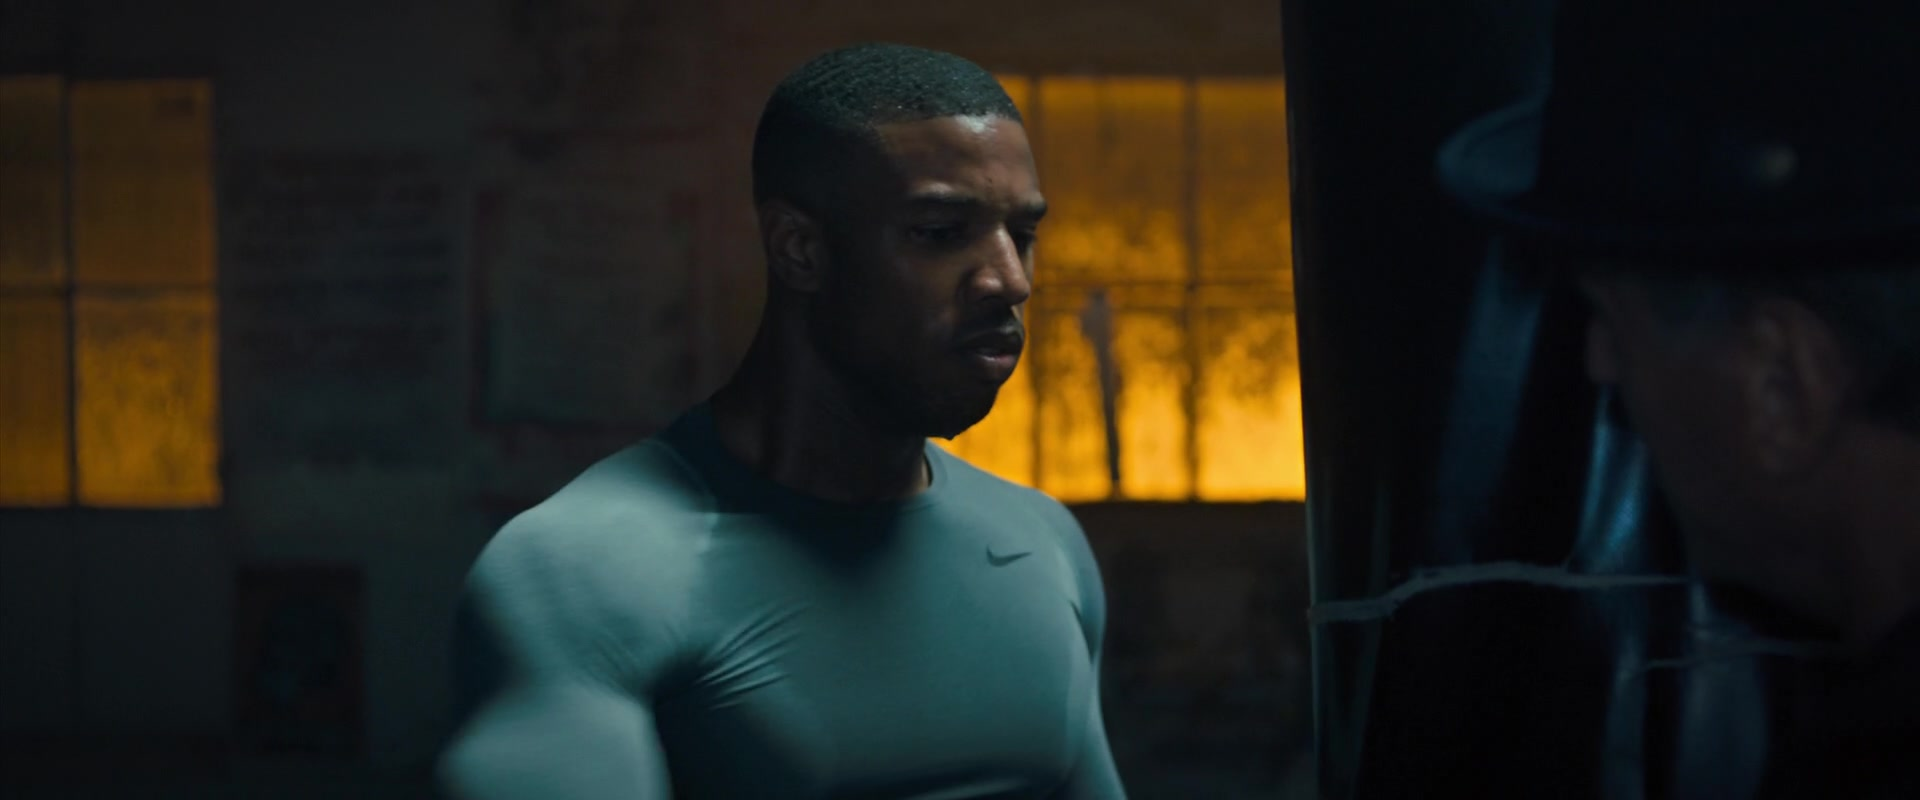 86944da41b5d96 Nike Men s Long Sleeve Top Worn by Michael B. Jordan in Creed 2 (2018